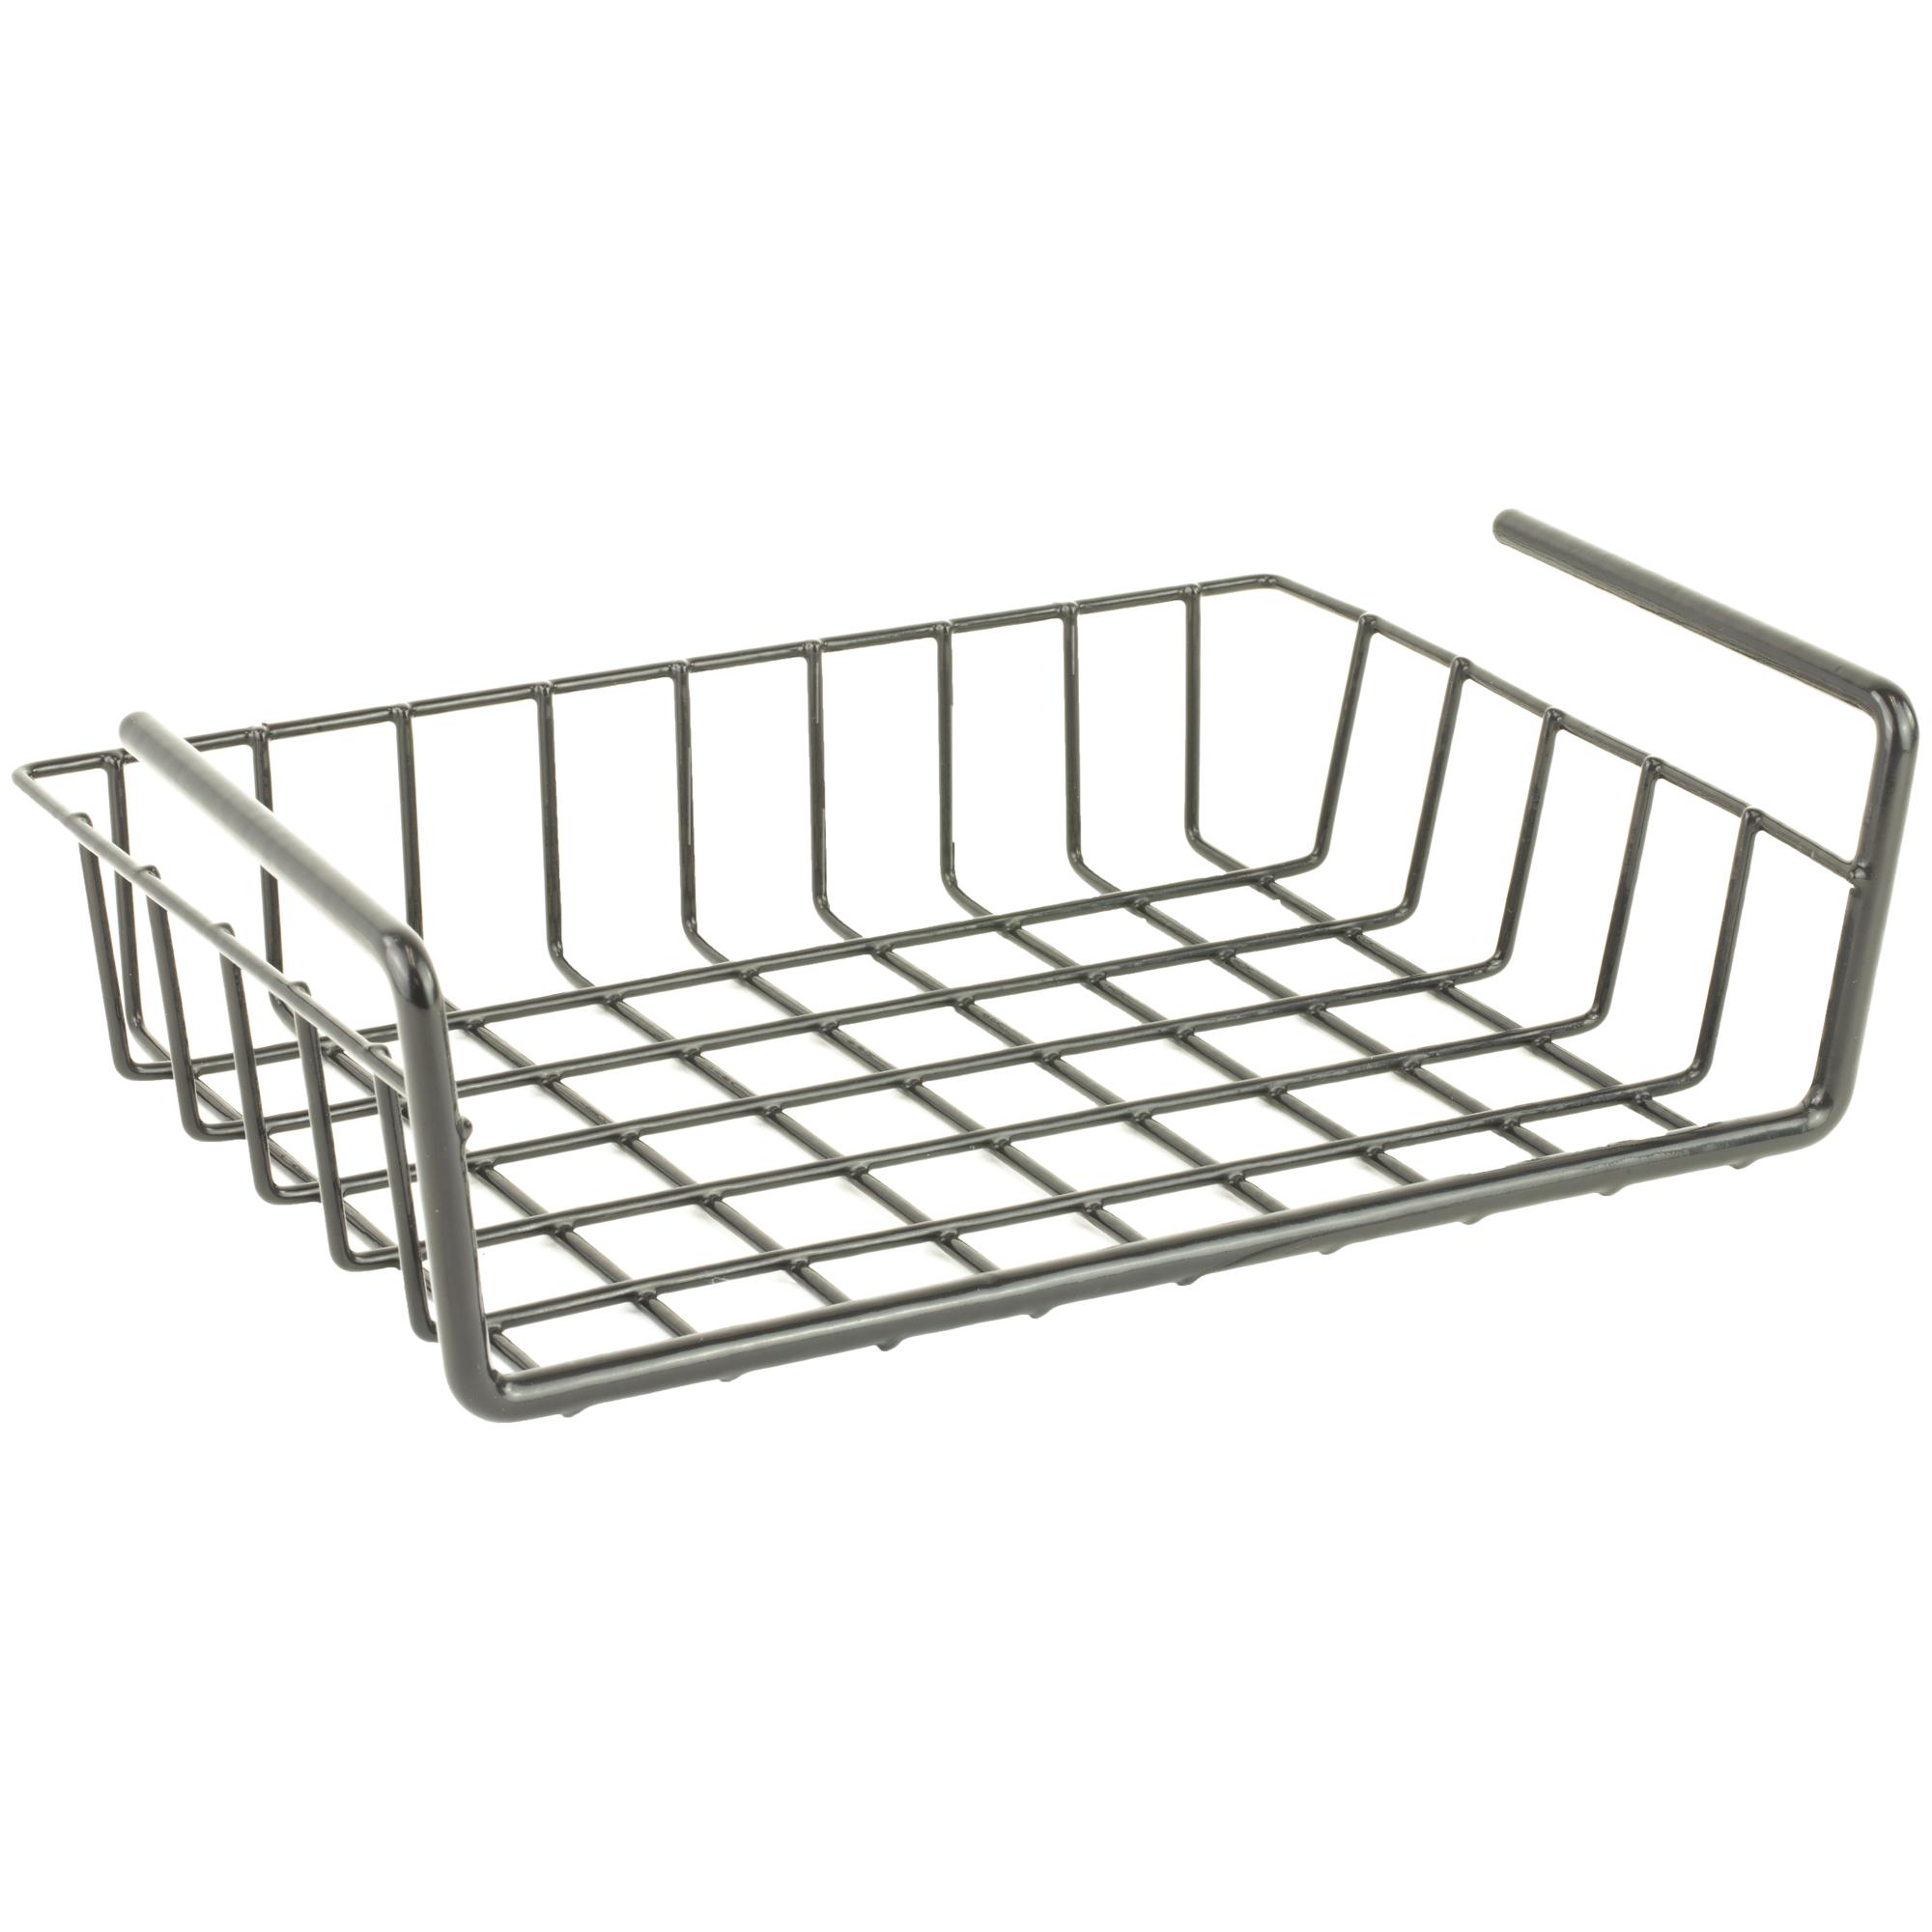 Snapsafe Hanging Shelf Basket 8.5x11